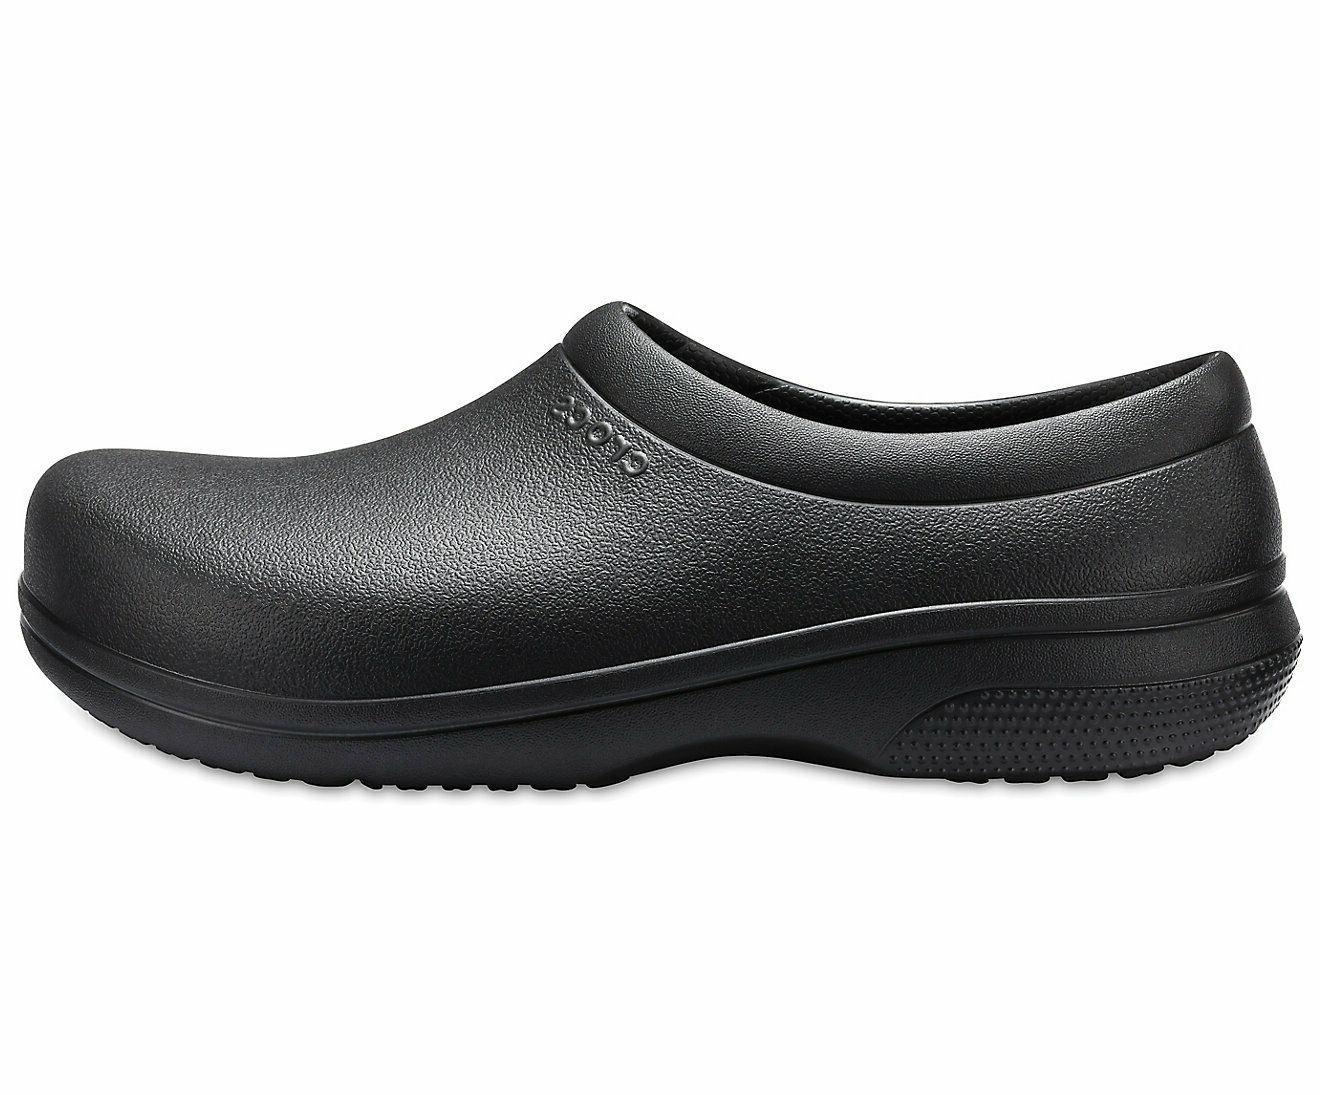 Crocs On-The-Clock Slip Resistant Proof Work